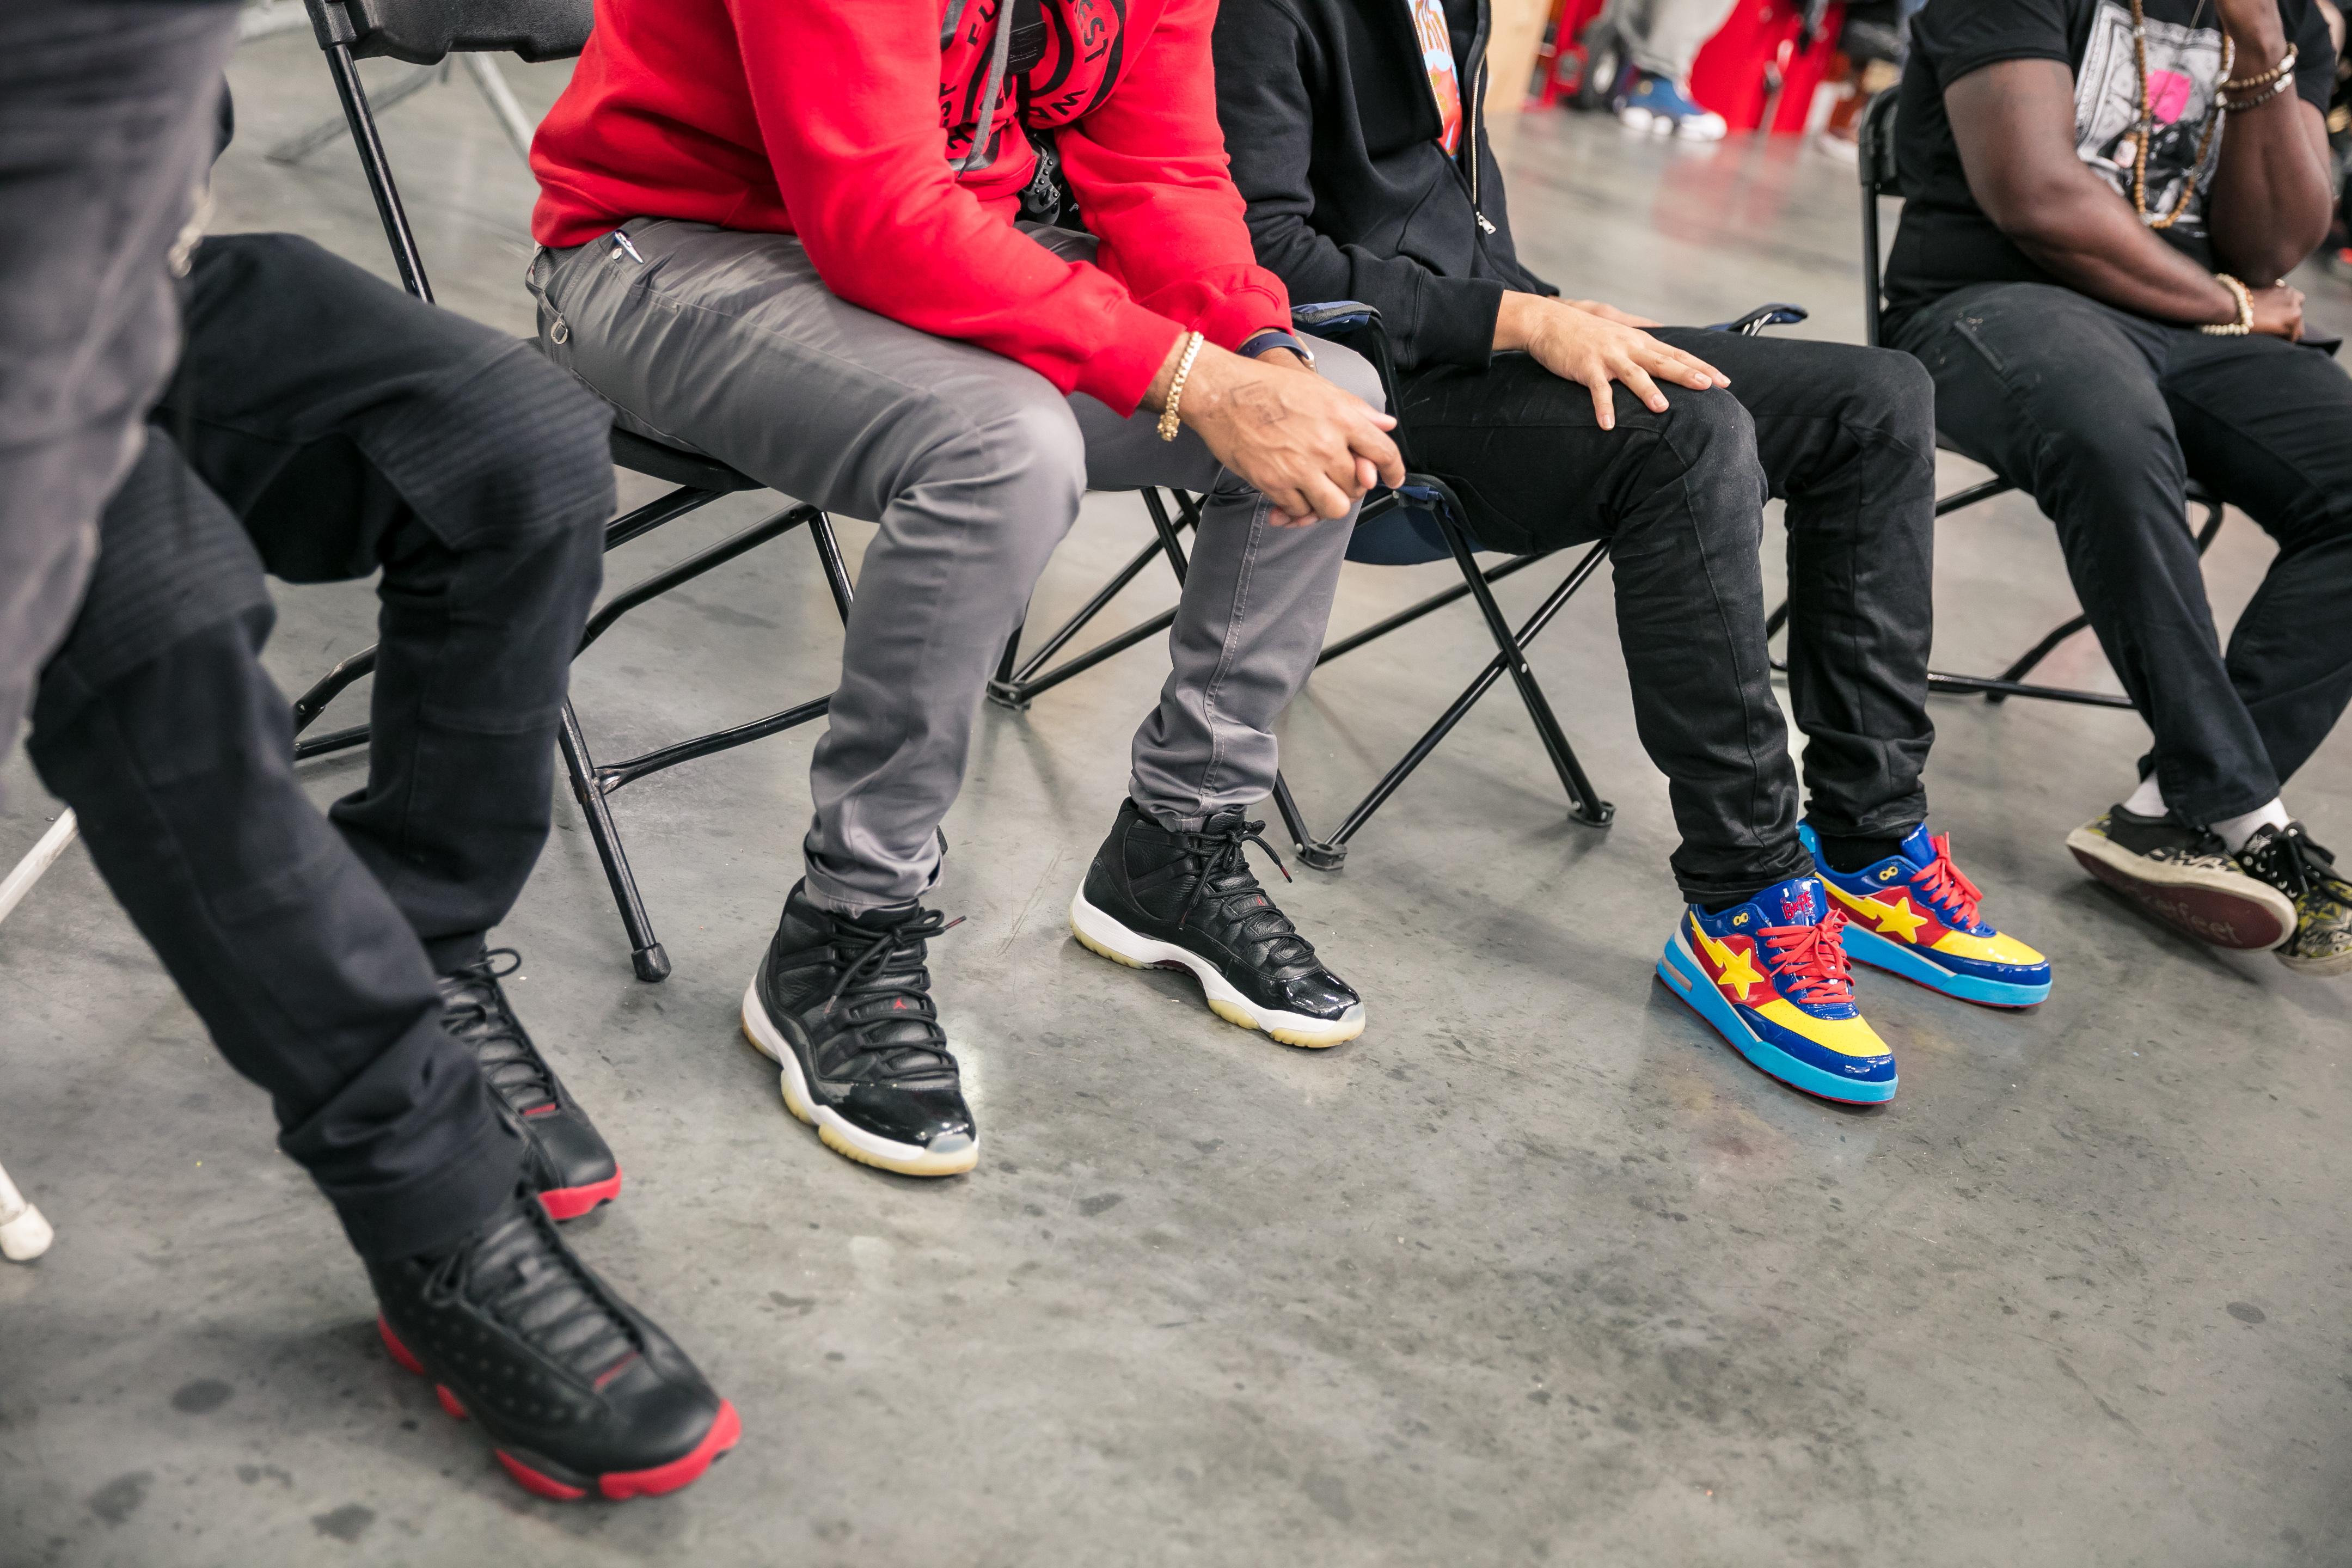 SneakerCon attendees